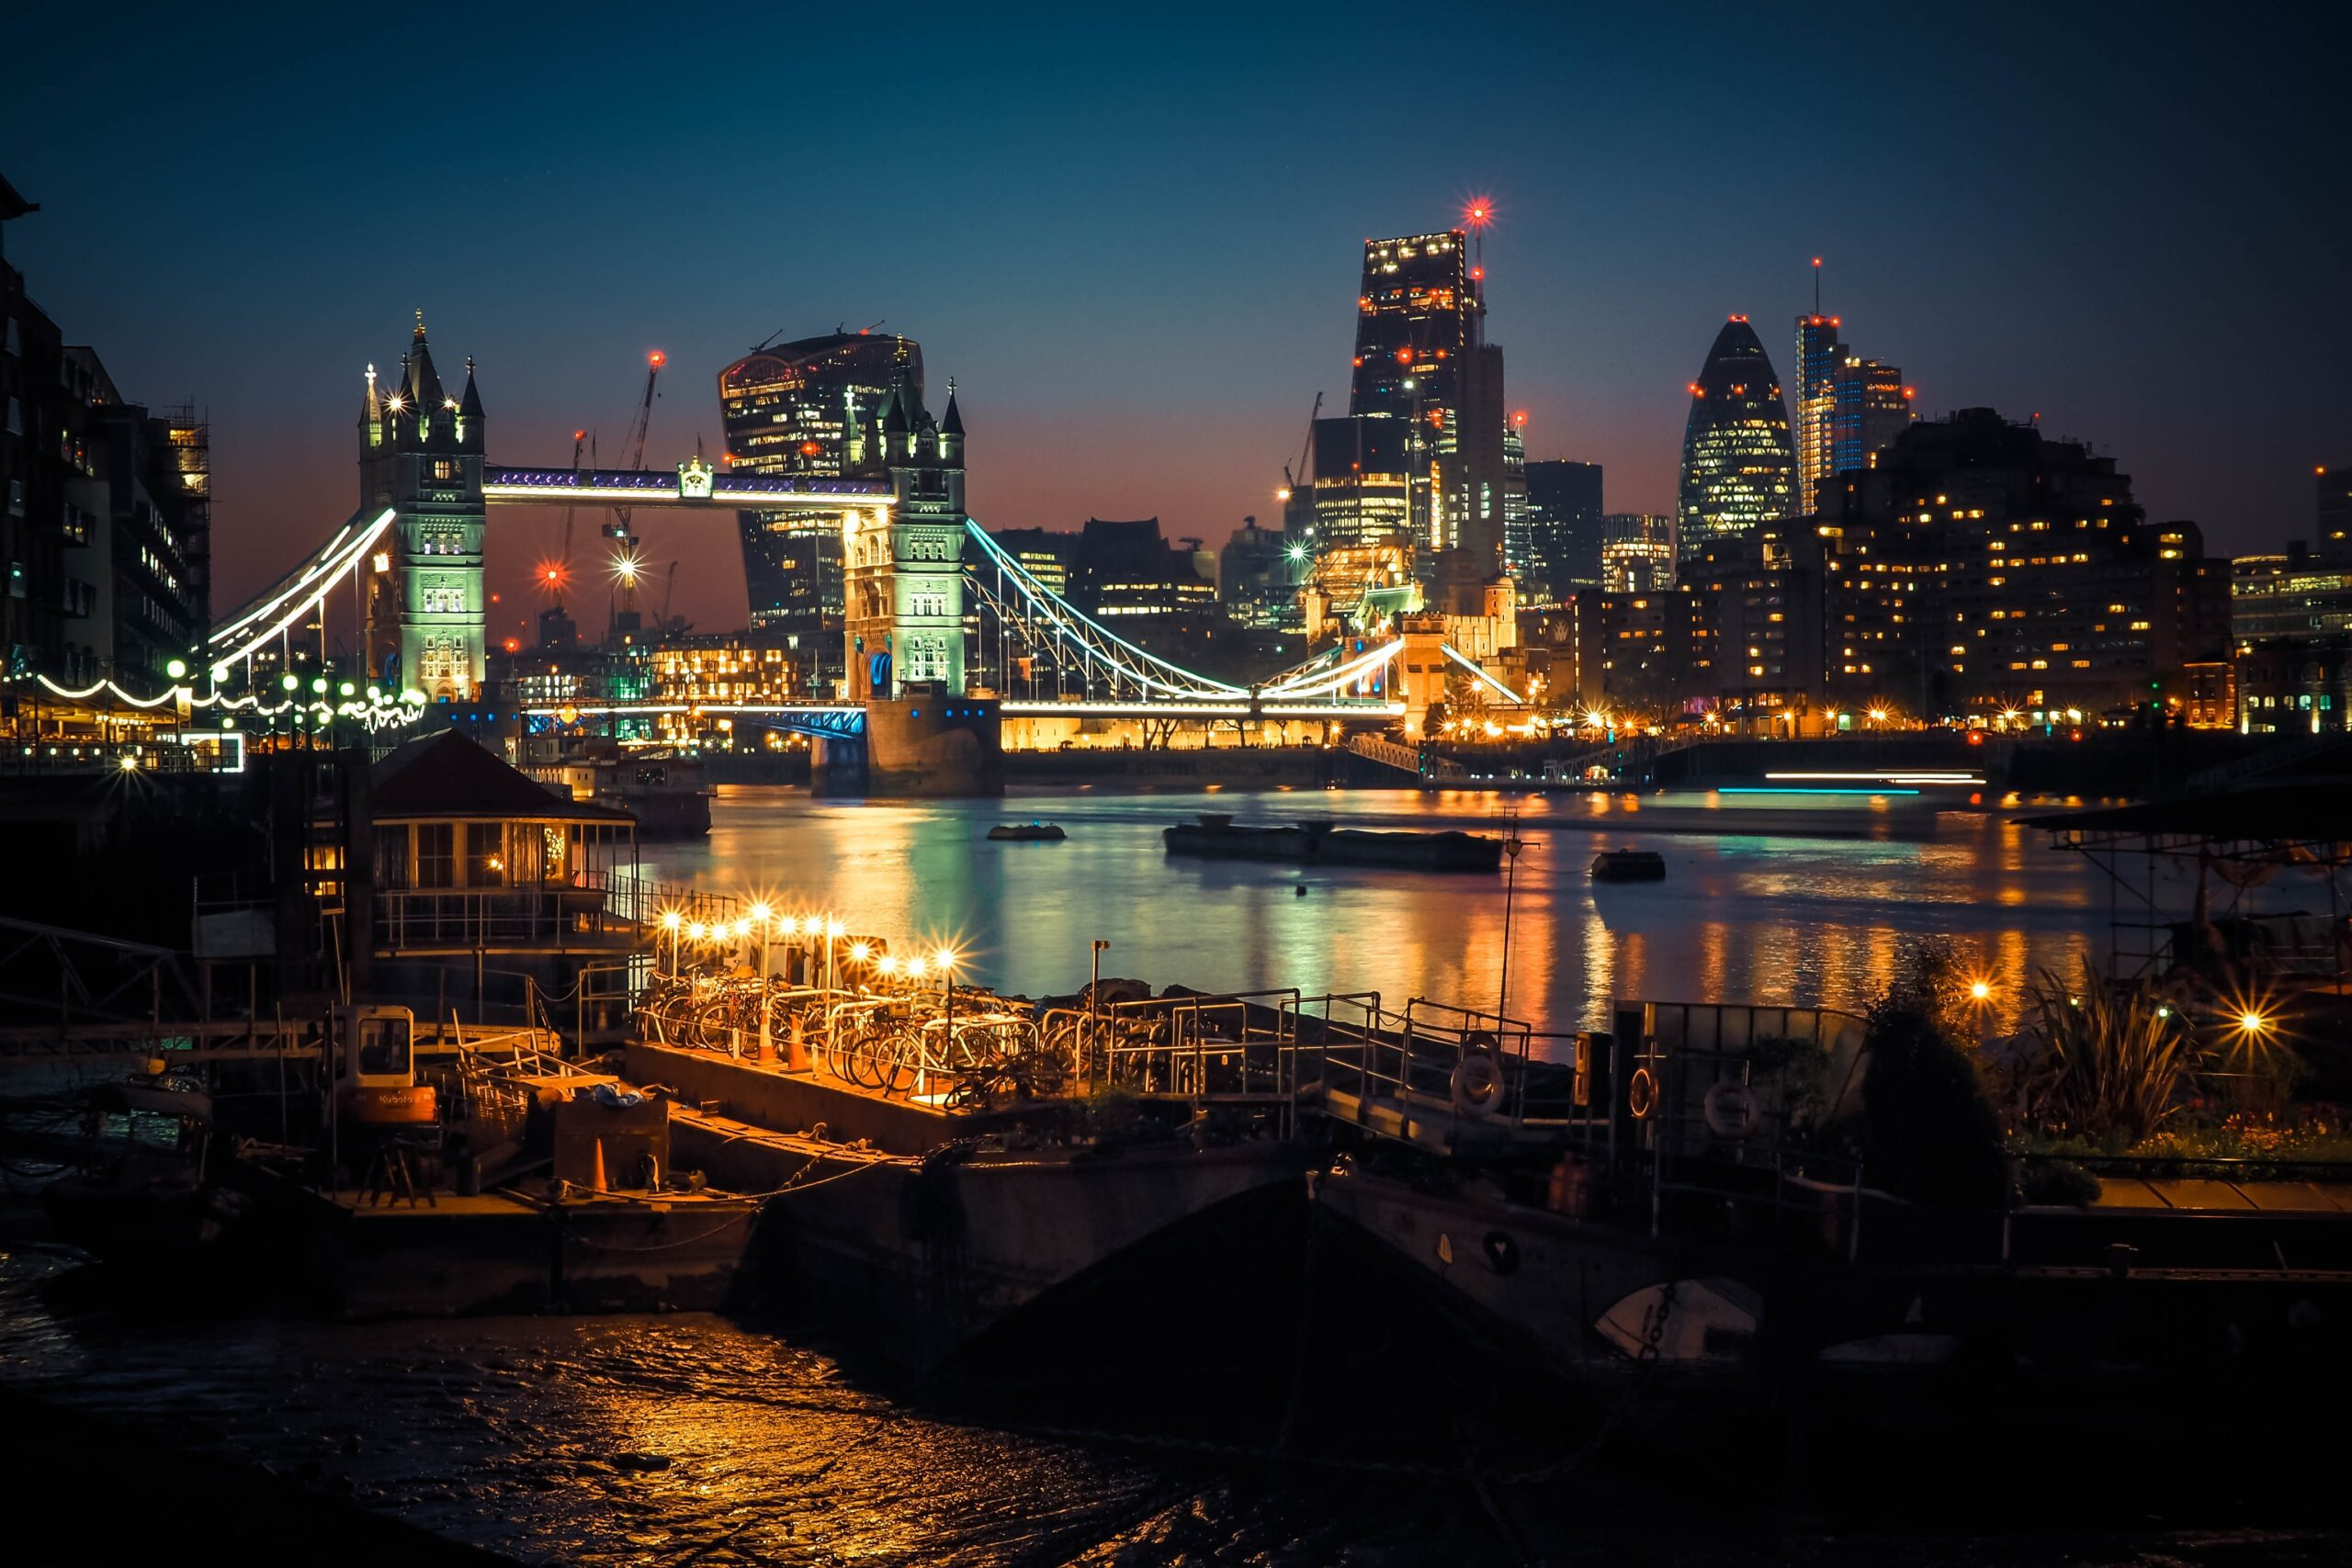 alexander-london-Thames River London Bridge at Night-unsplash